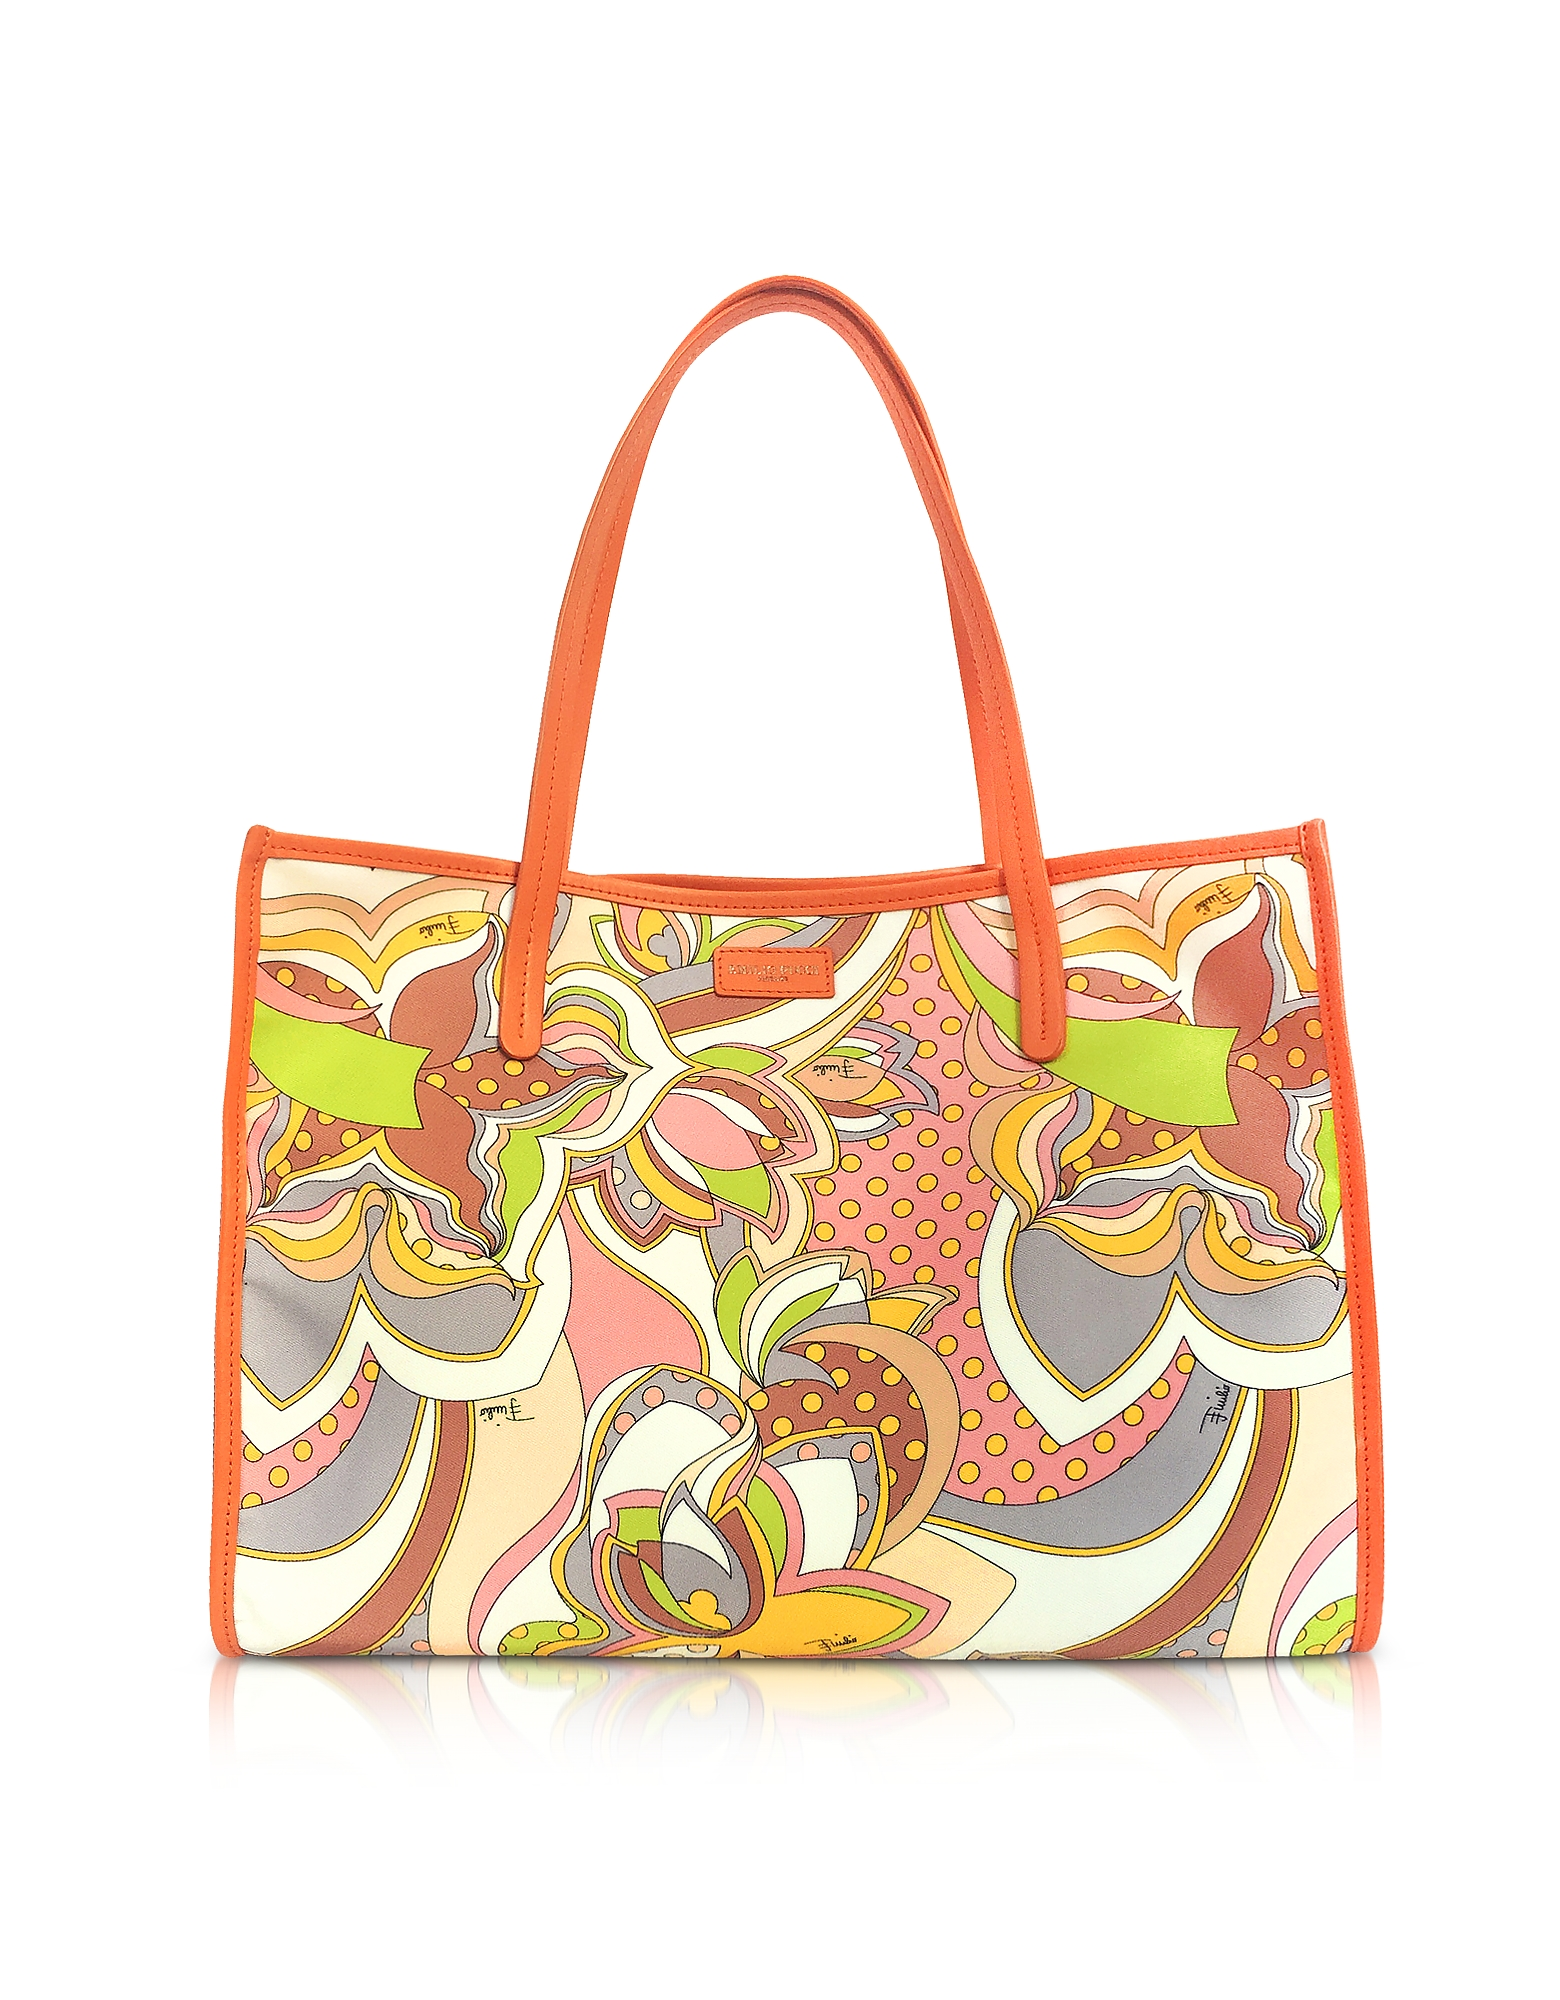 Emilio Pucci Handbags, Sun Yellow Fabric Tote Bag